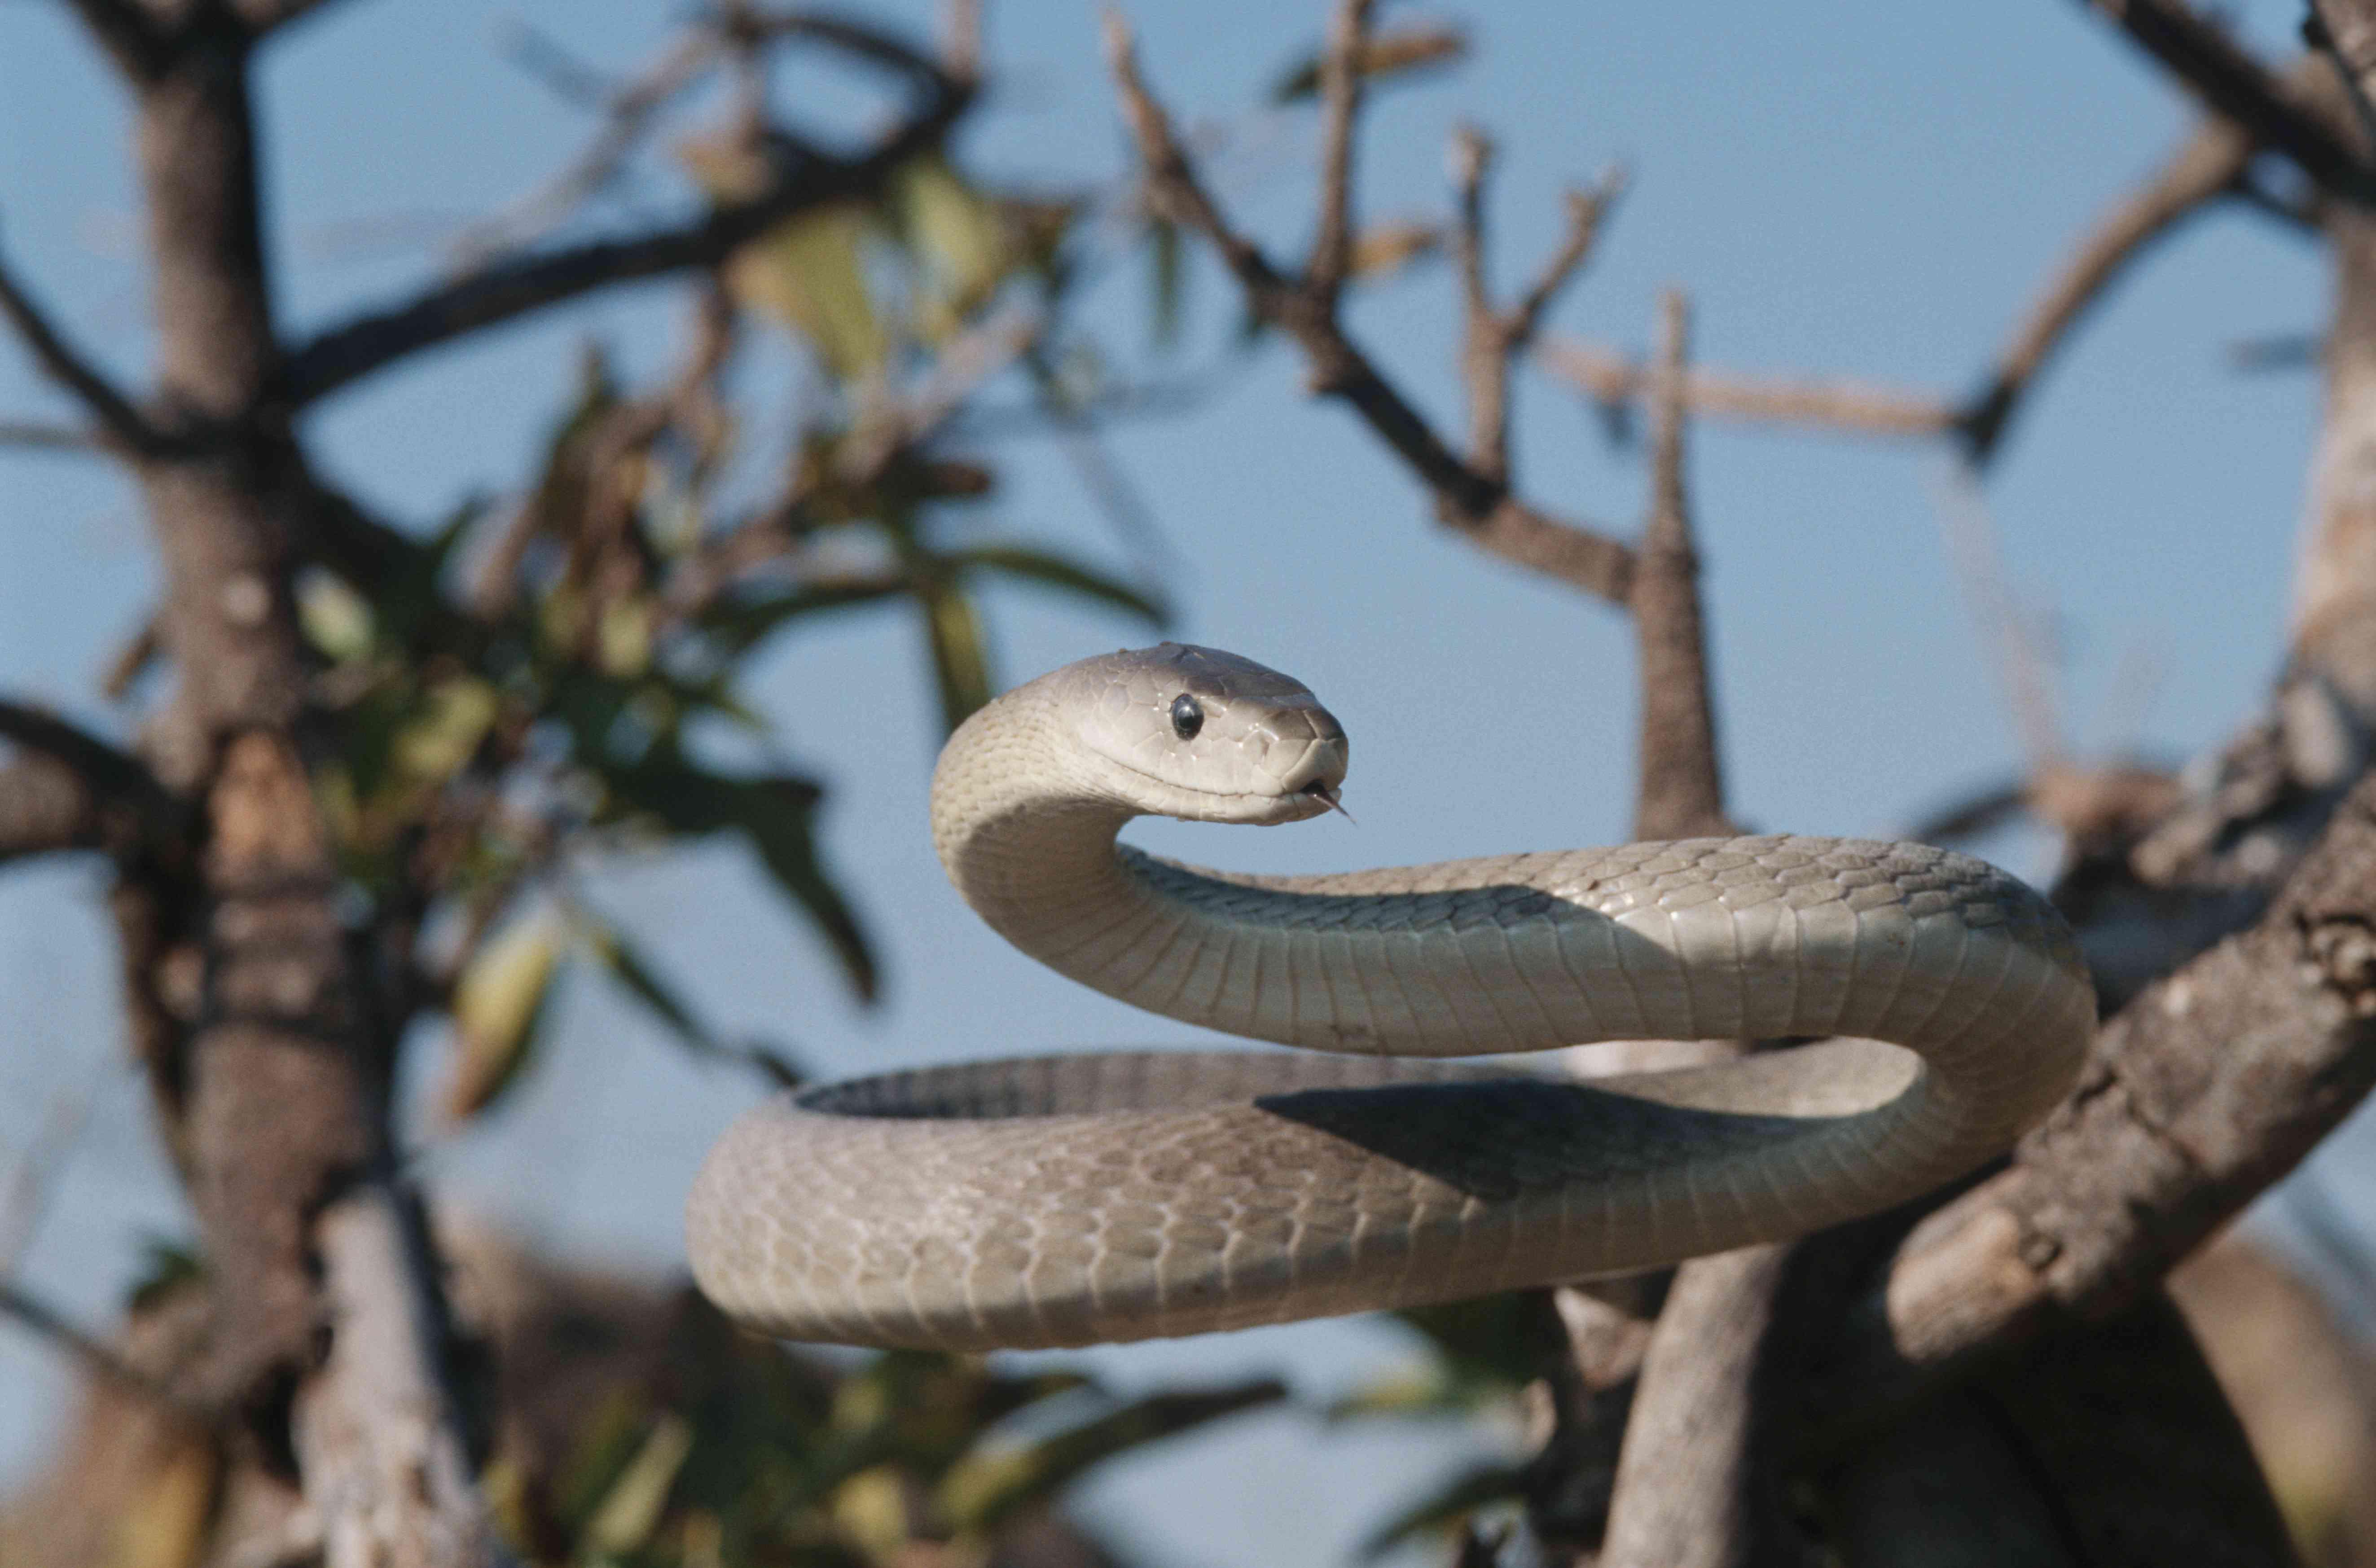 Black Mamba on alert in a tree